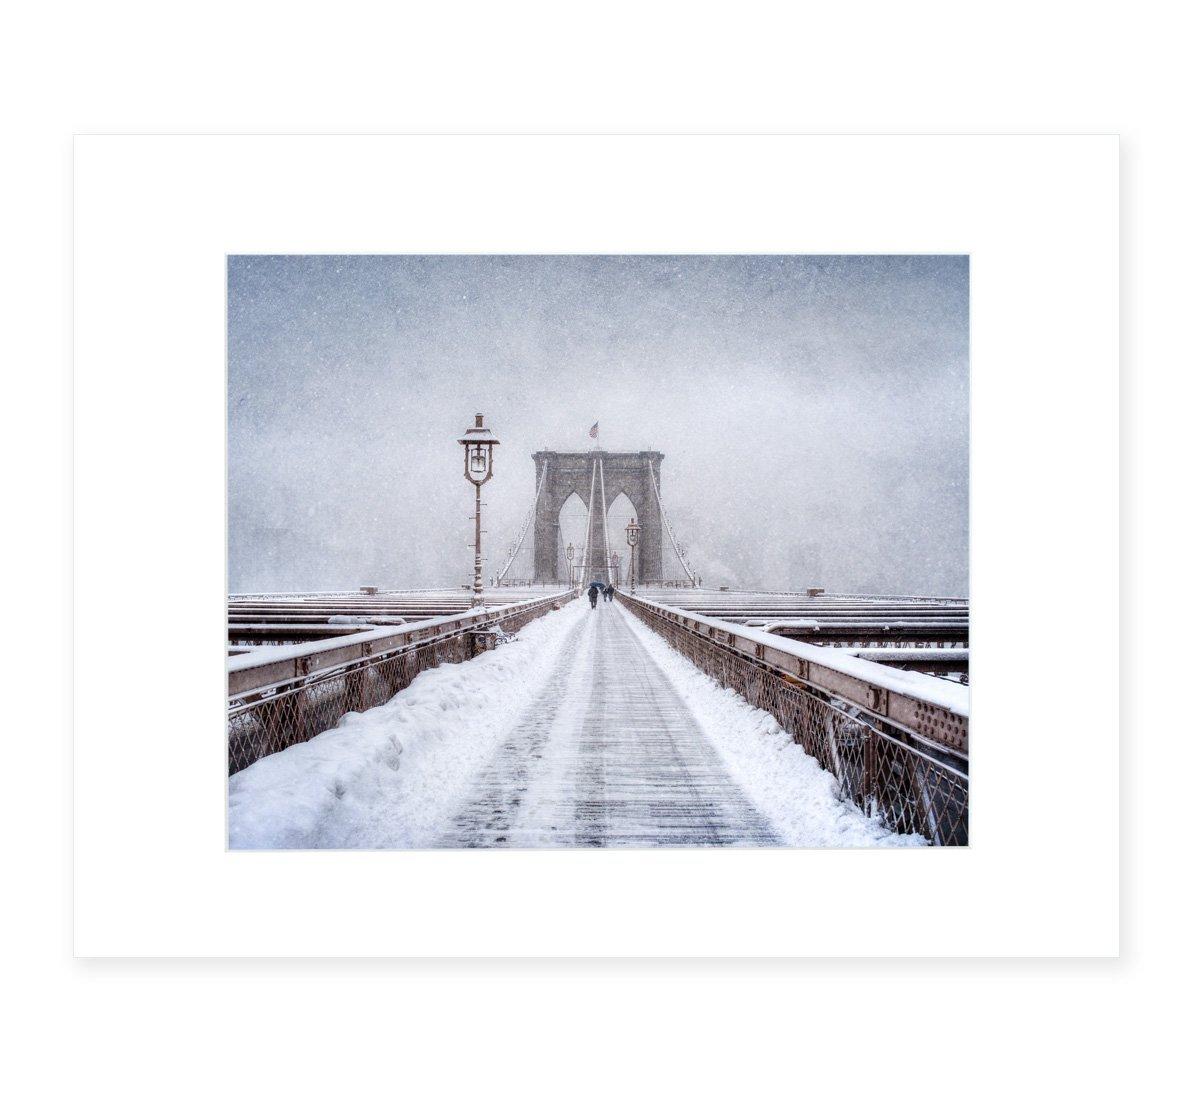 New York City Wall Art, Brooklyn Bridge Winter Walkway, NYC Decor, 8x10 Matted Photographic Print (fits 11x14 frame), 'Brooklyn Snow'